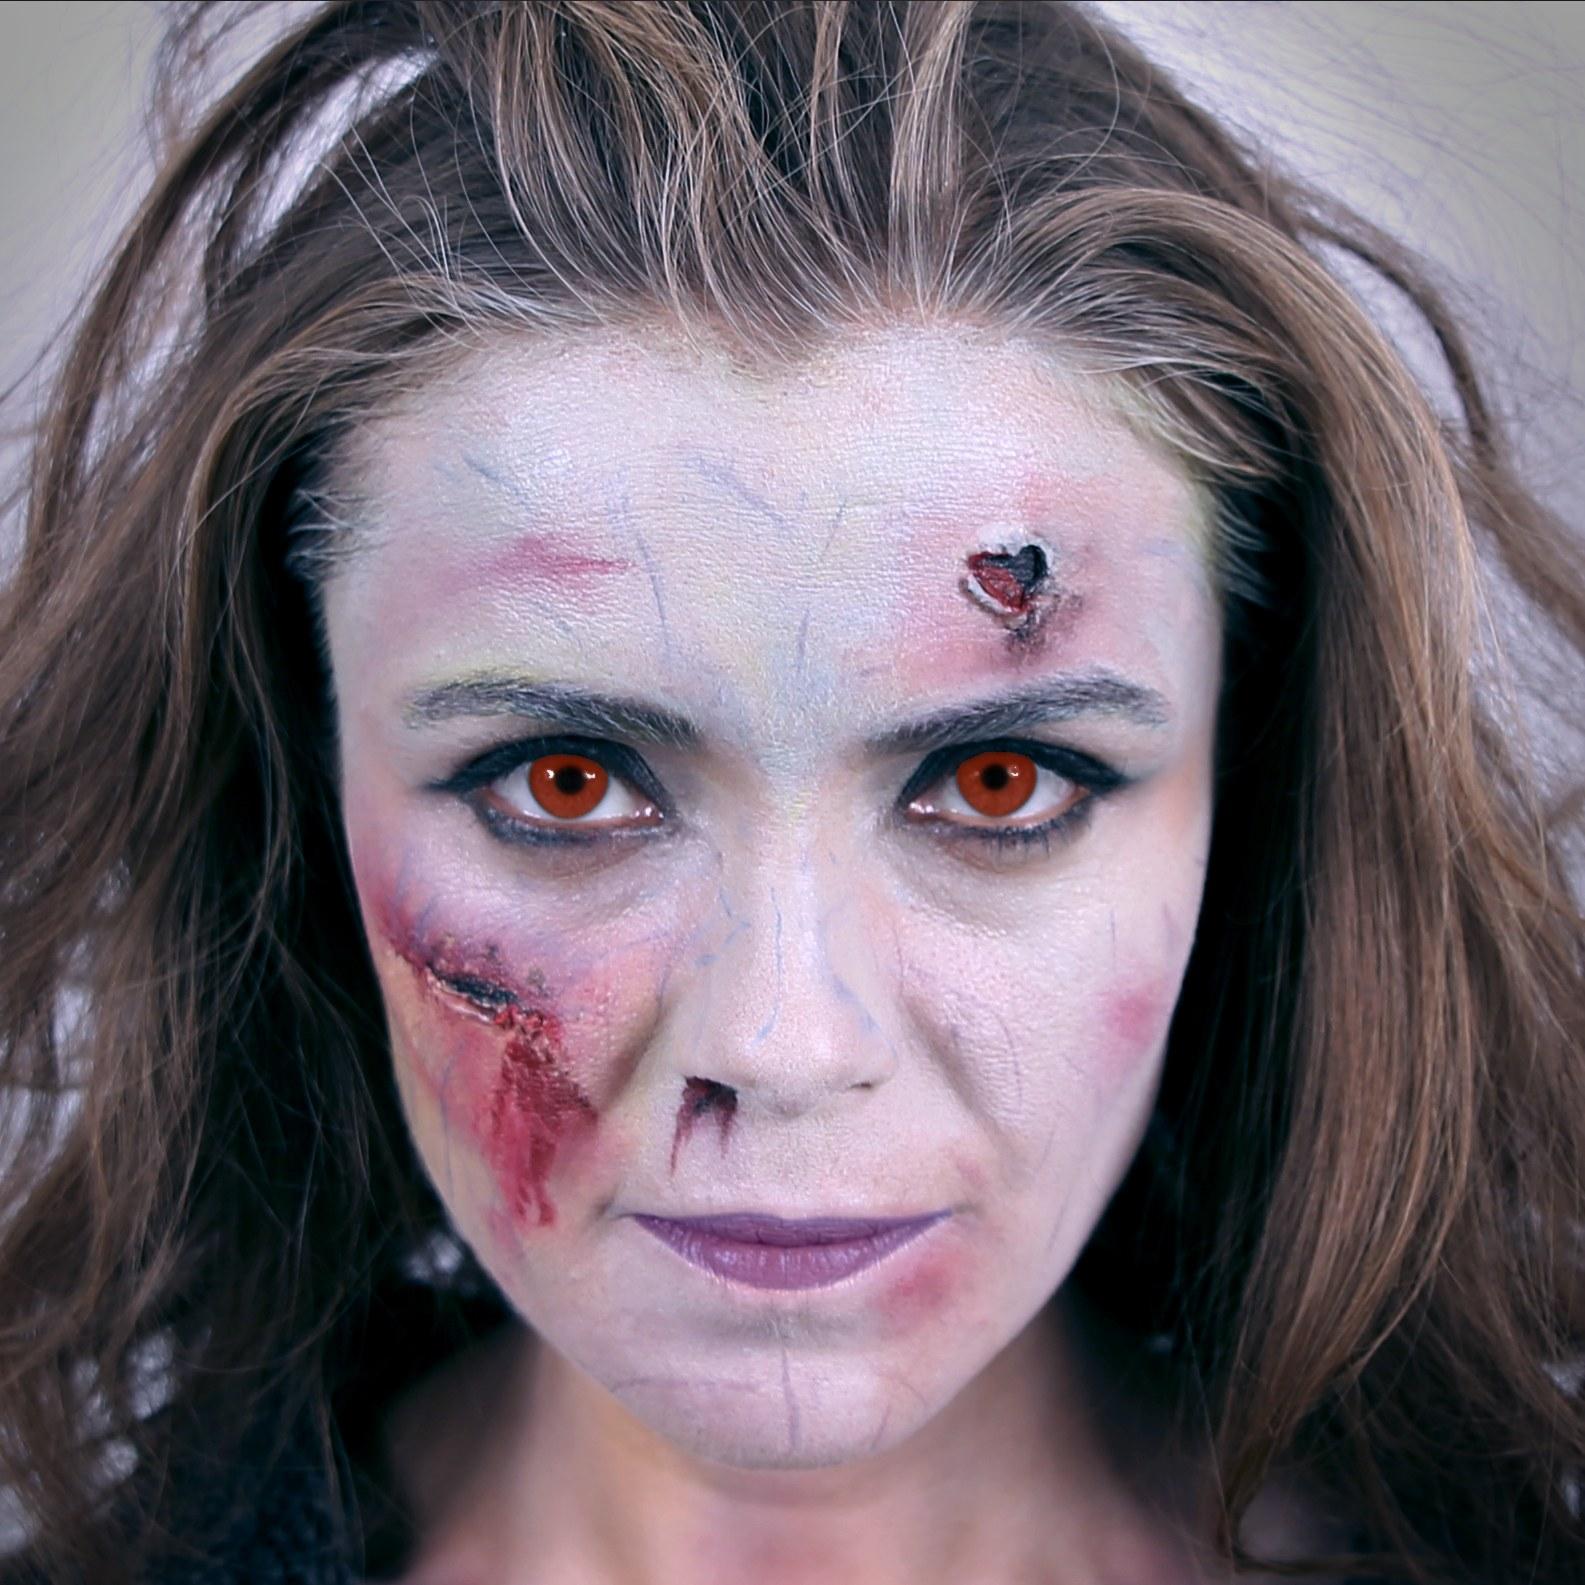 Vampire dating sites uk in Perth